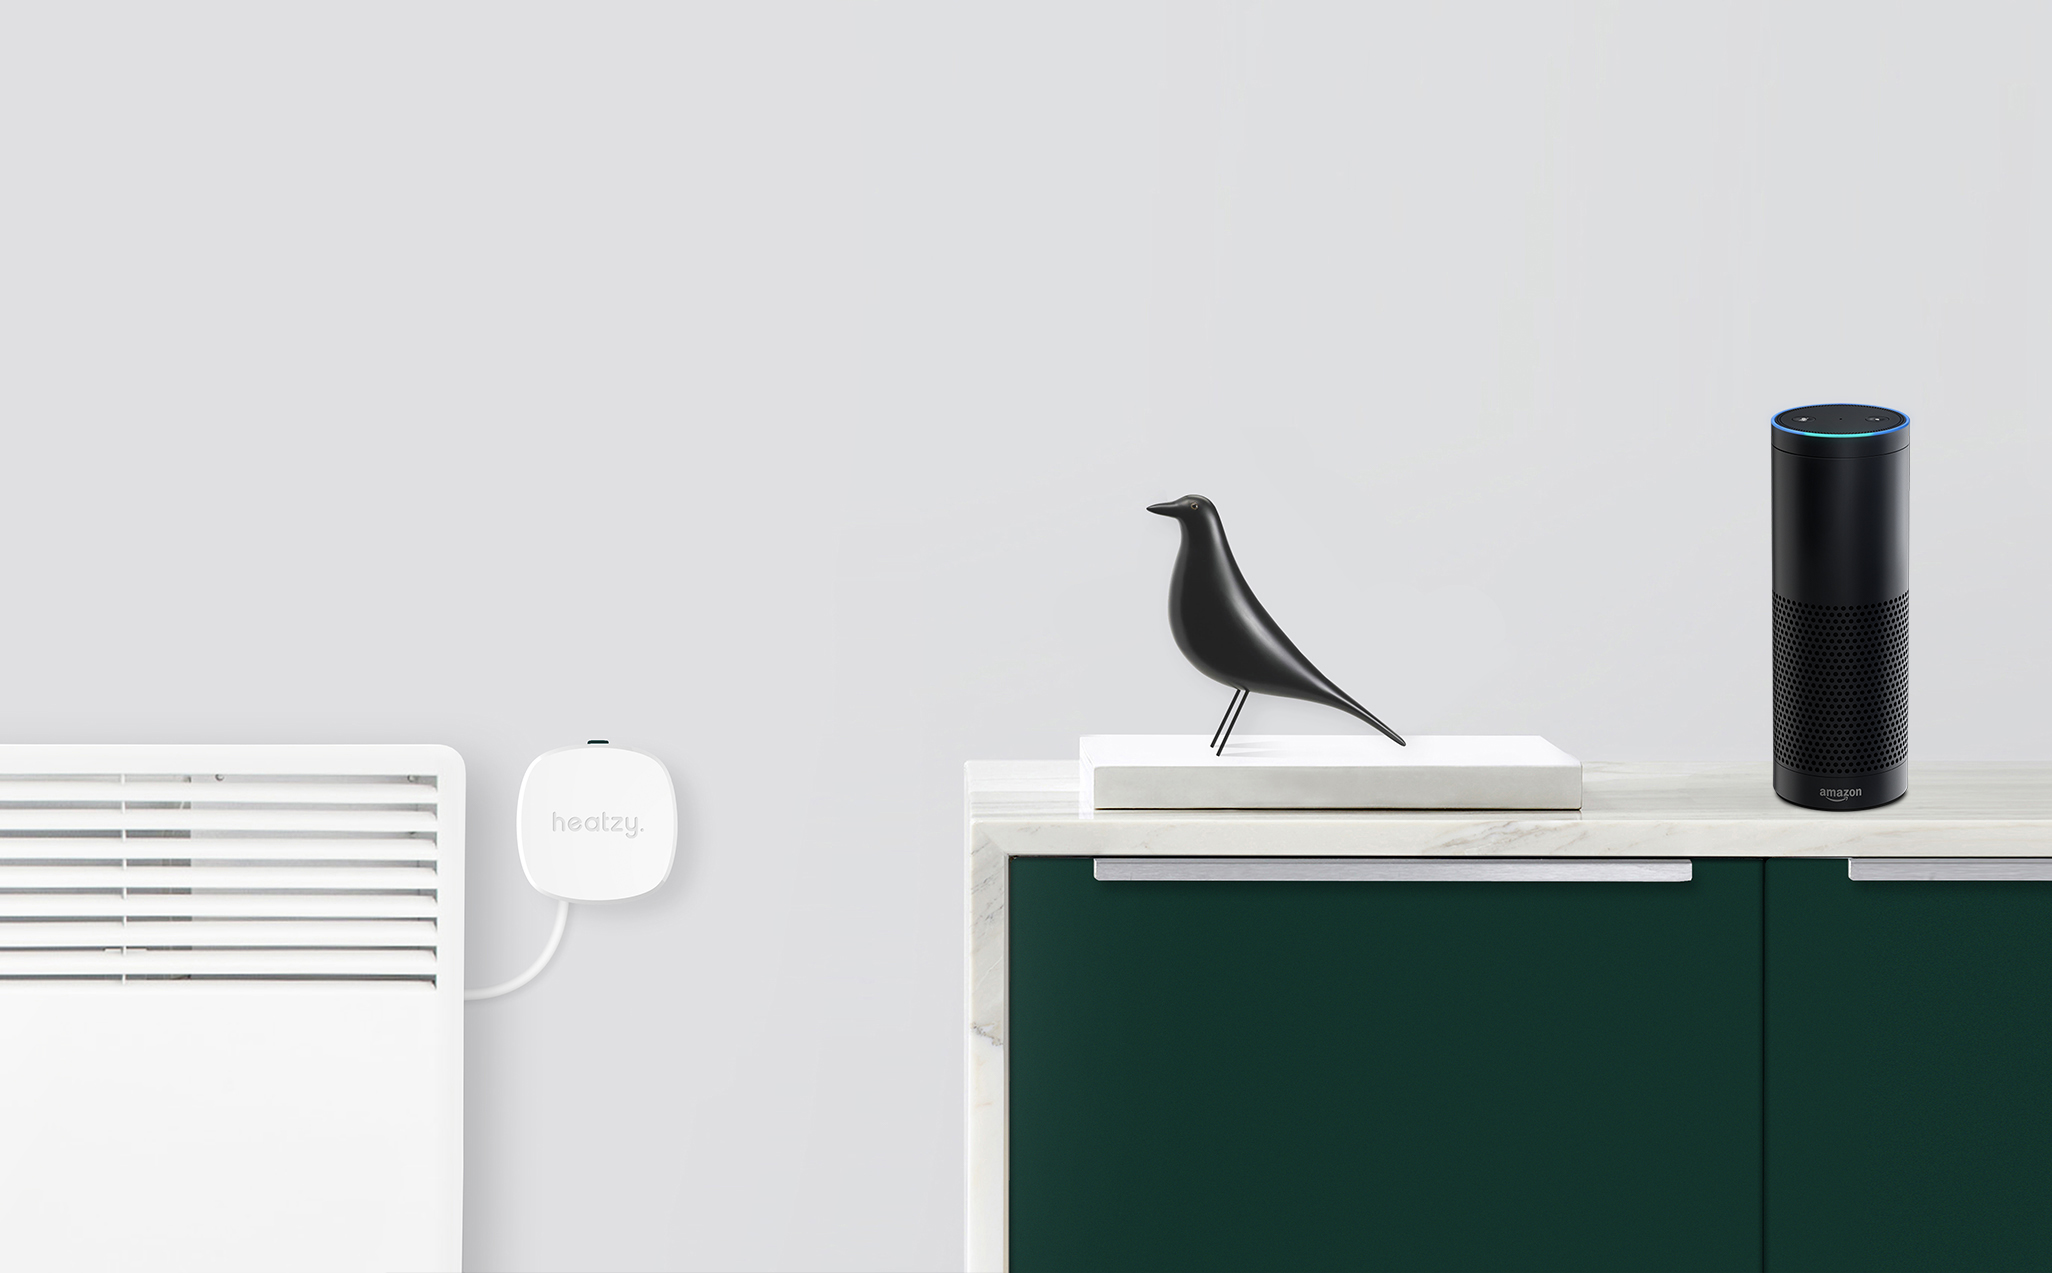 Heatzy compatible Alexa